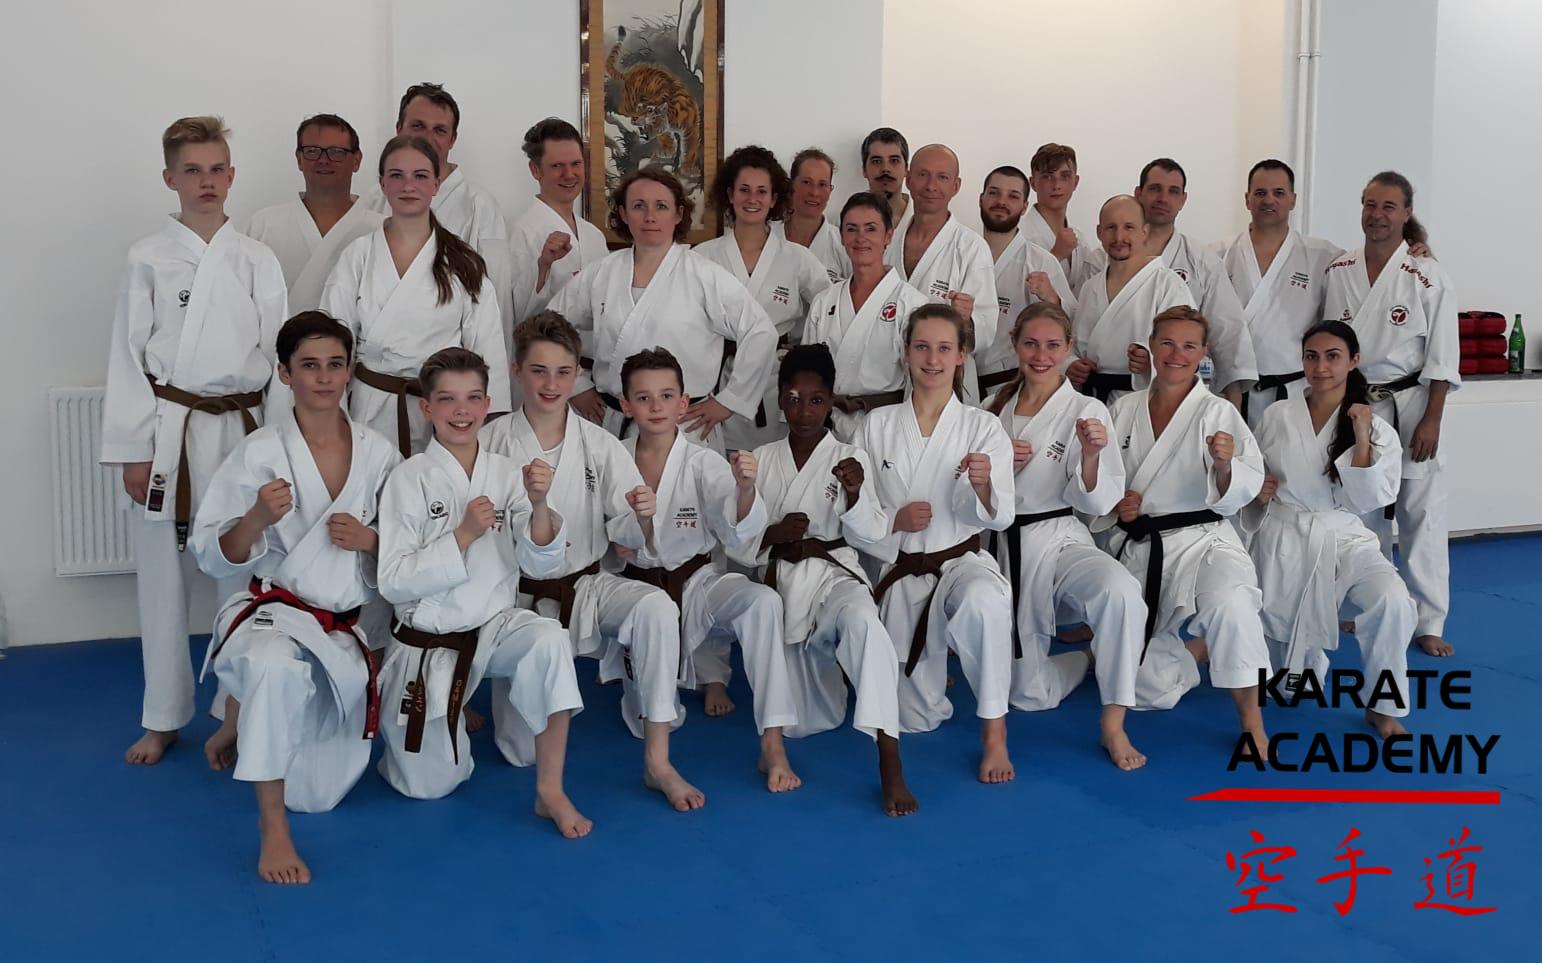 2019 training mit neuhofenern 1.png